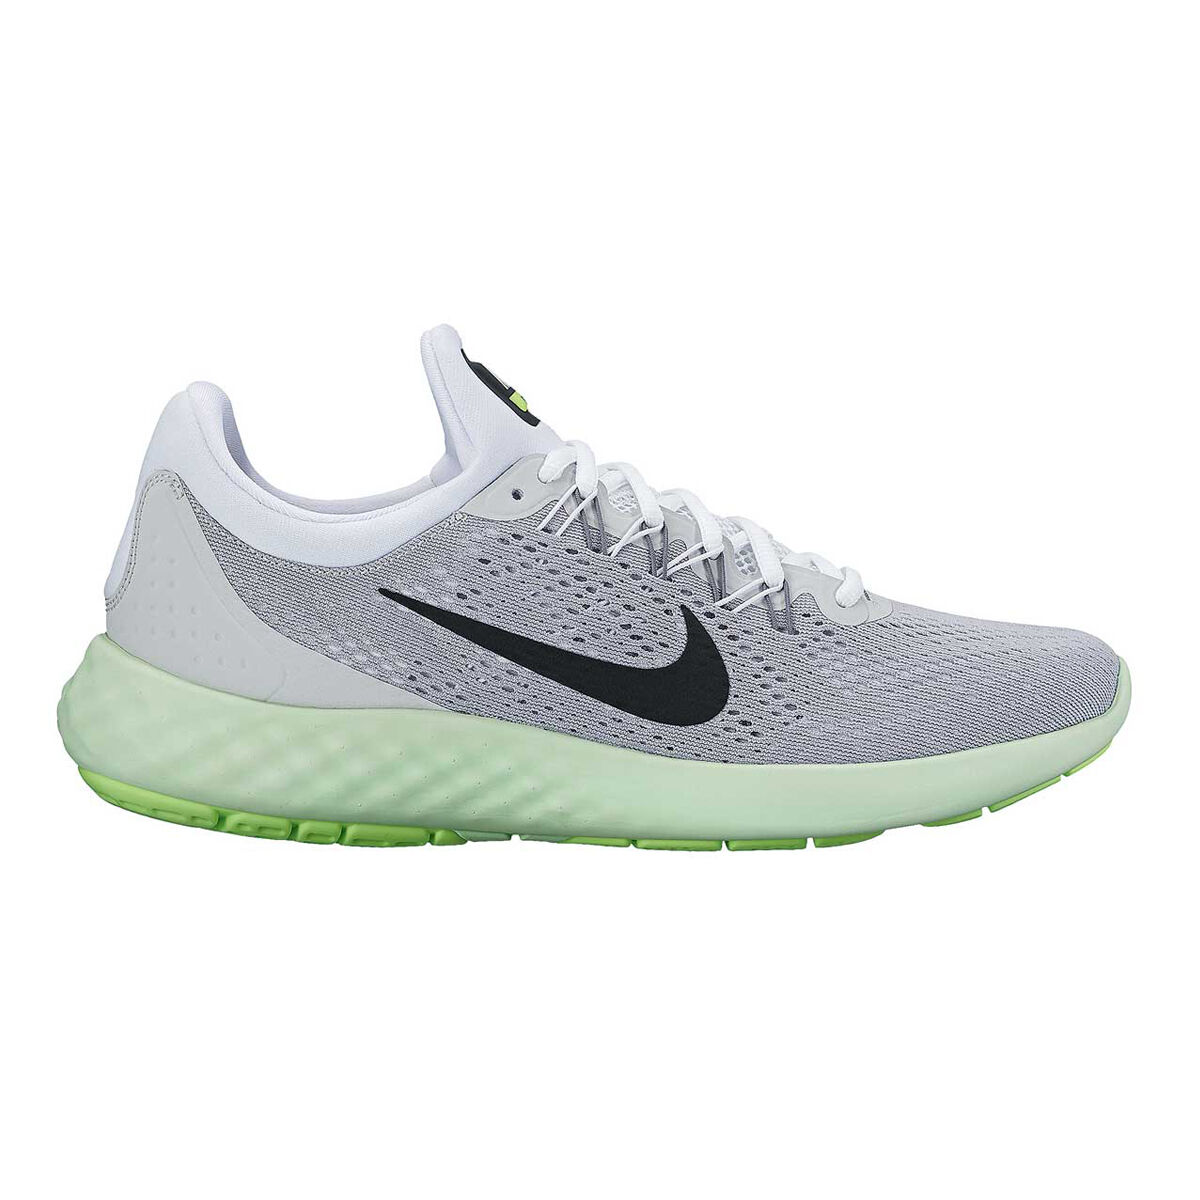 Shoes White Skyelux Running Us 8 Grey 5Rebel Lunar Nike Womens vmON0n8w